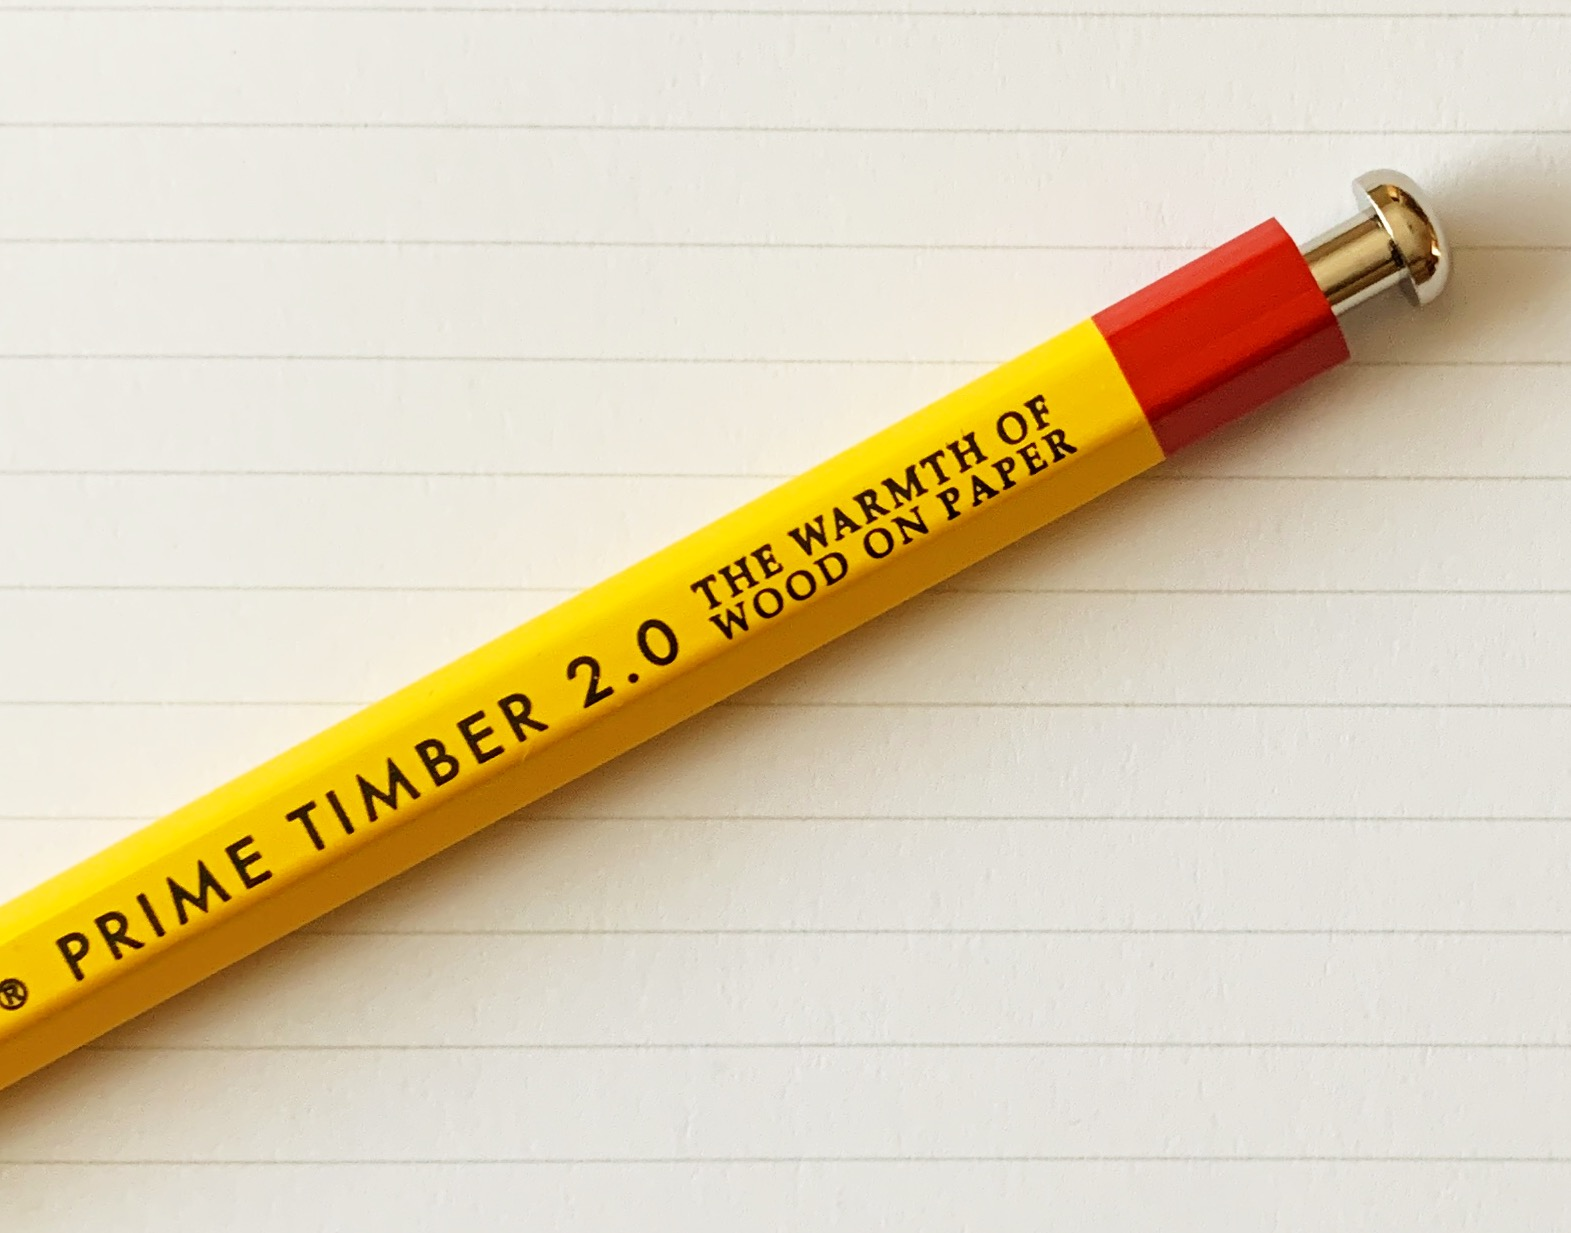 Penco Prime Timber 2.0 mm Mechanical Pencil Barrel